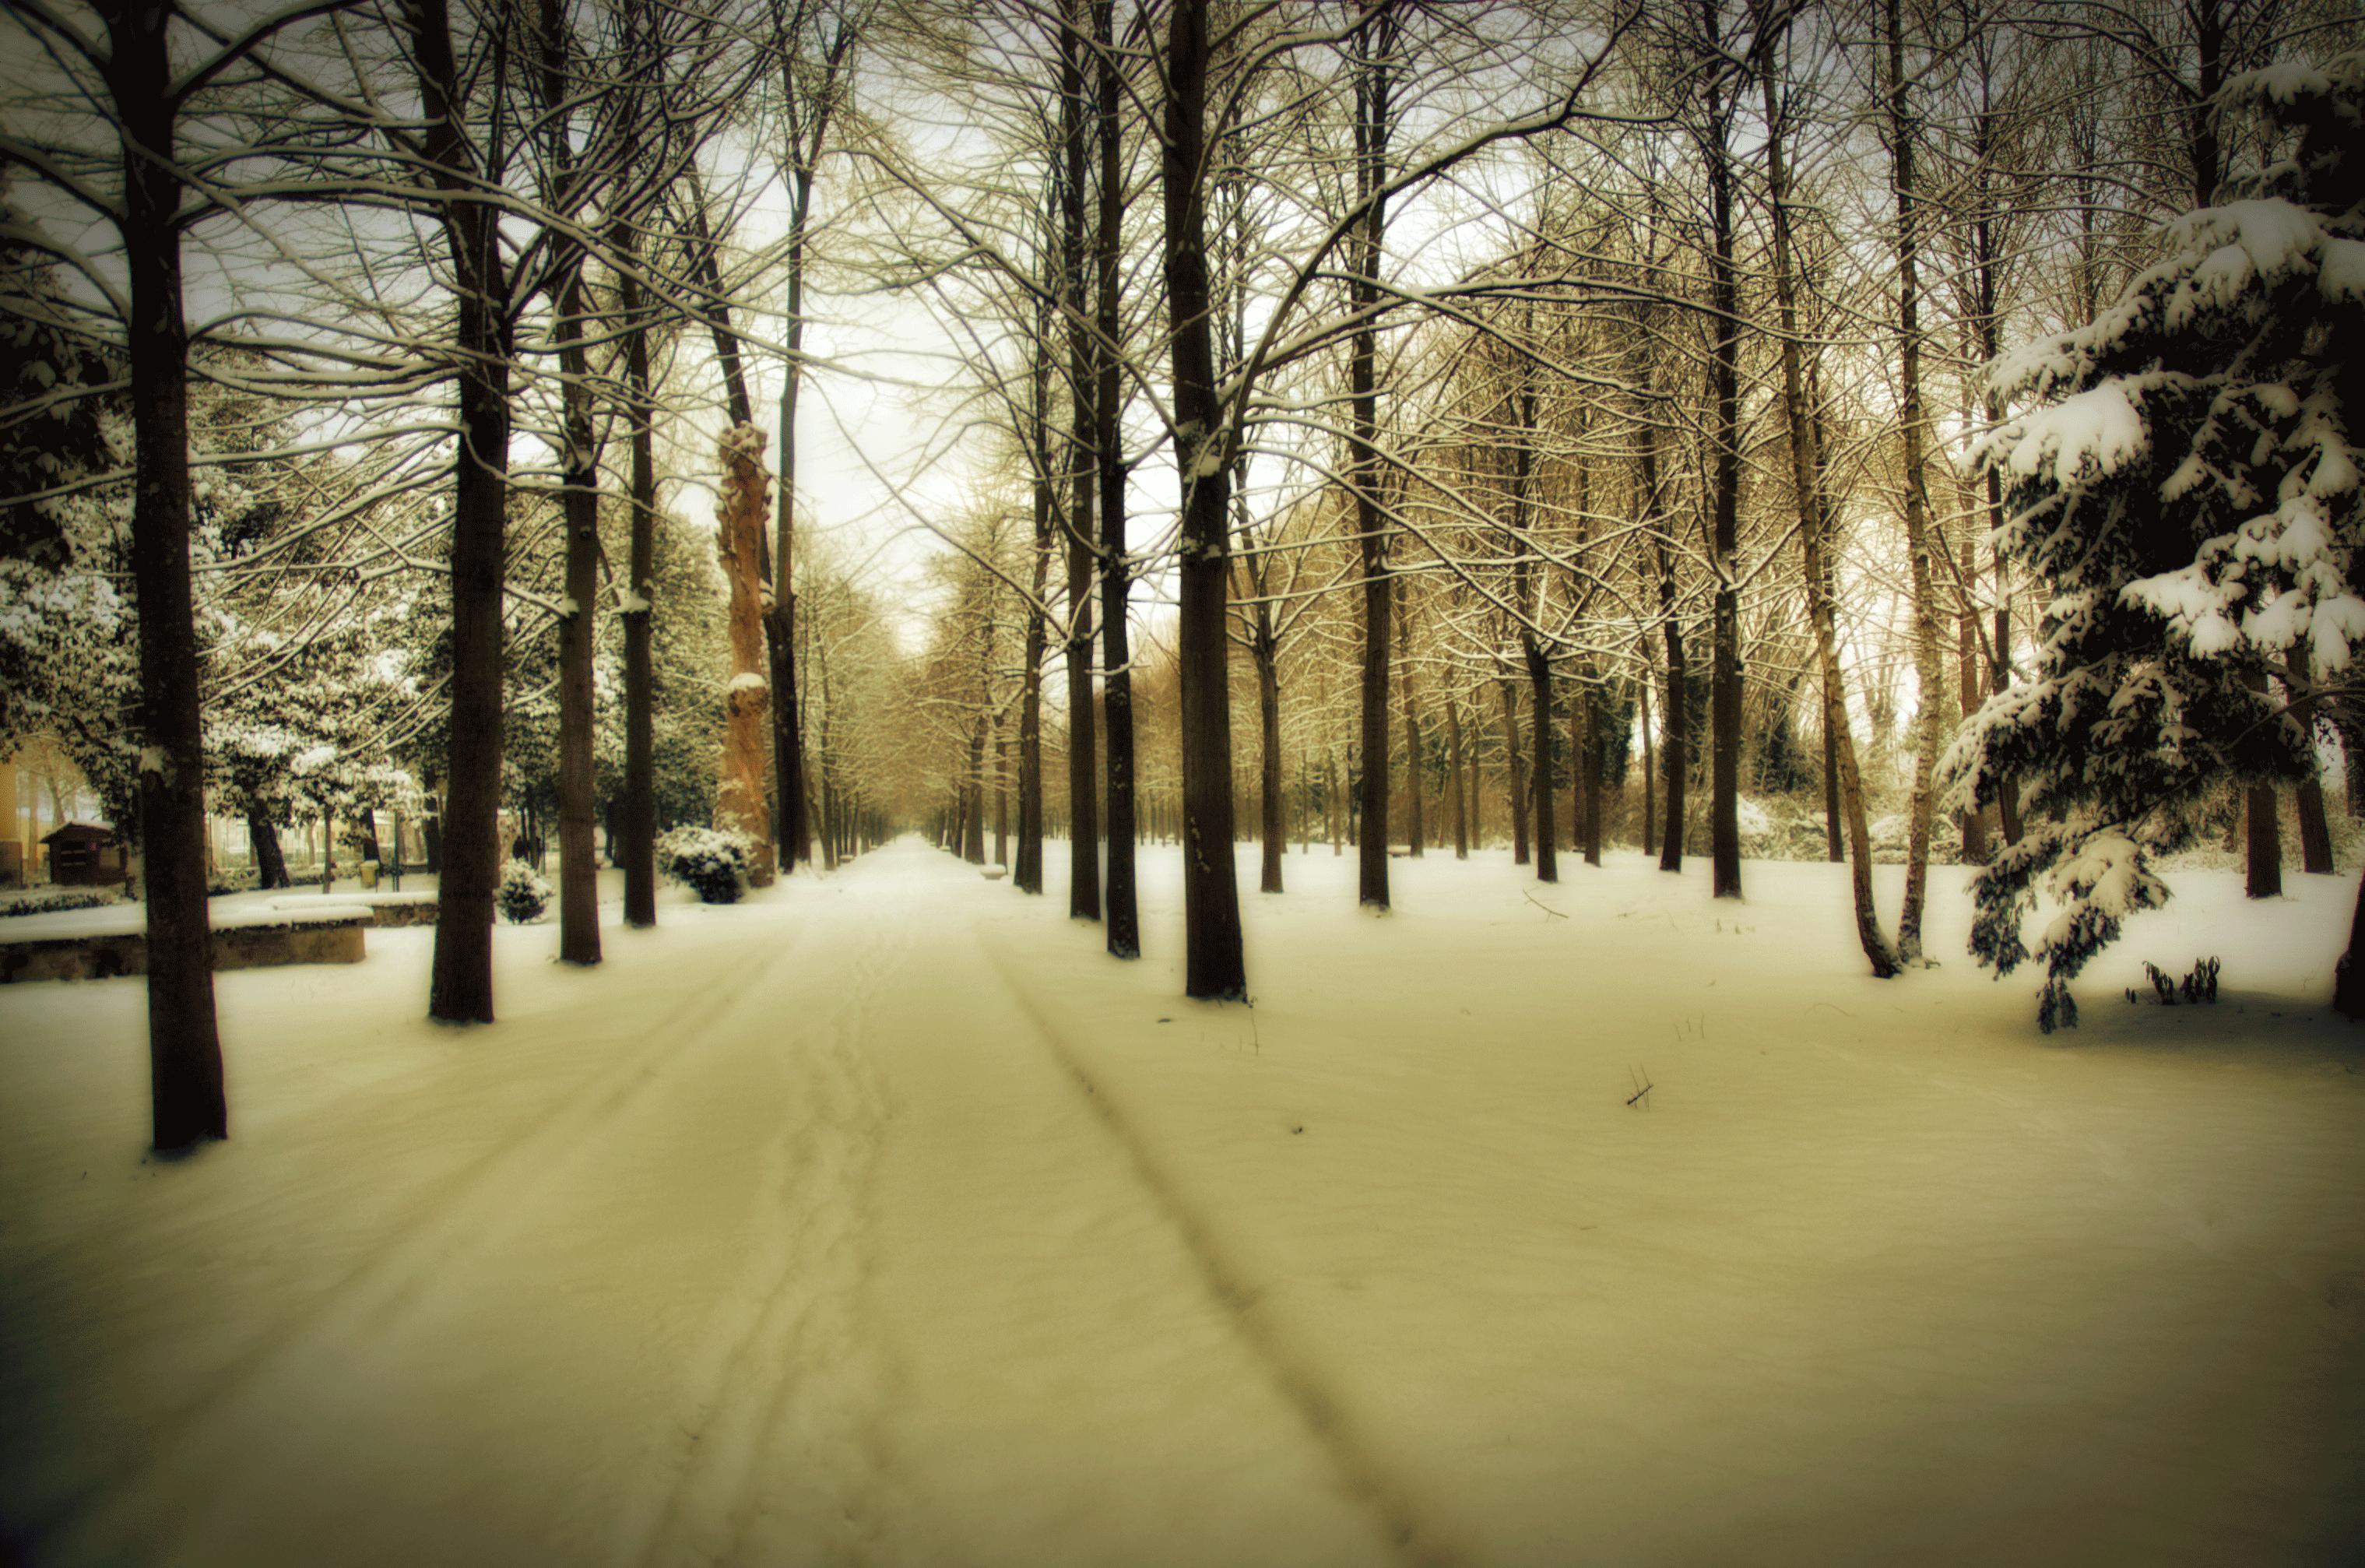 La grande nevicata del Gennaio 1963